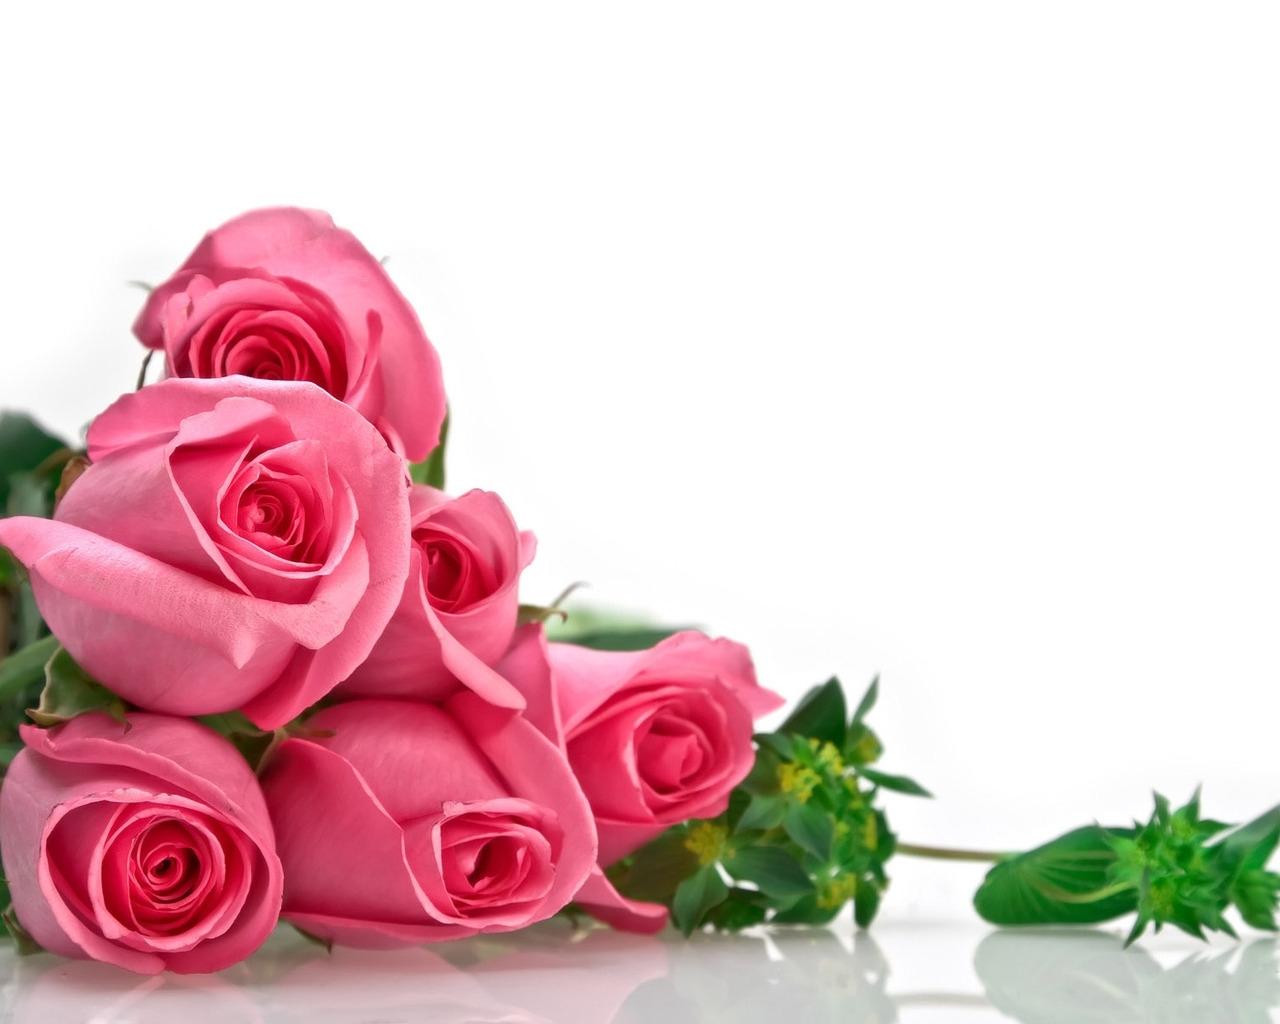 Papel De Parede Flores Rosa Mentira Flor Plantar Petala